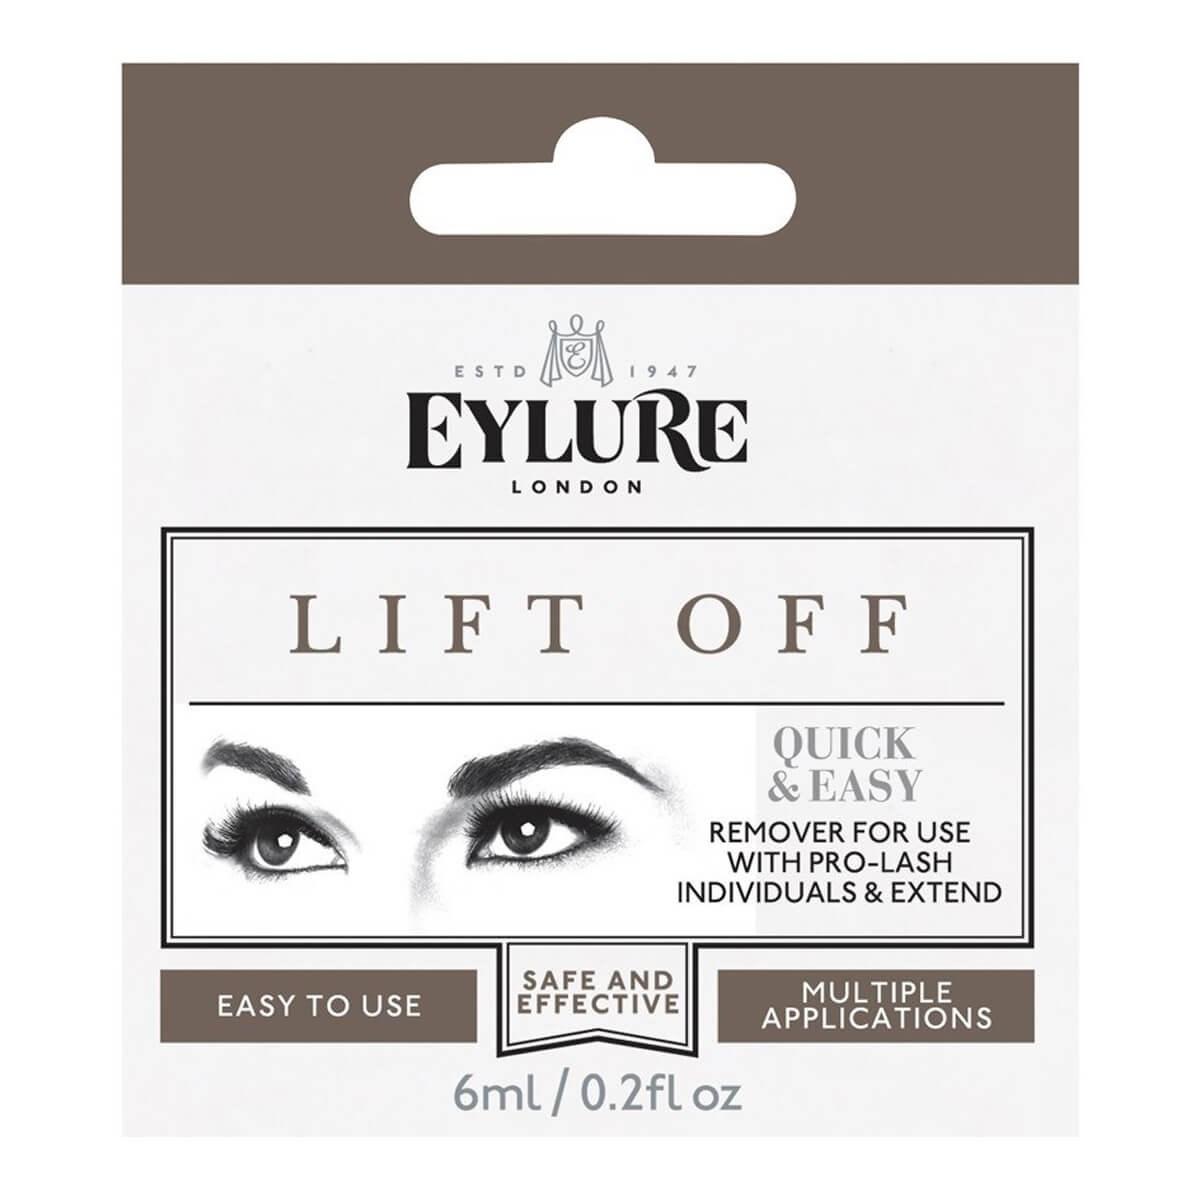 Eylure Lift Off